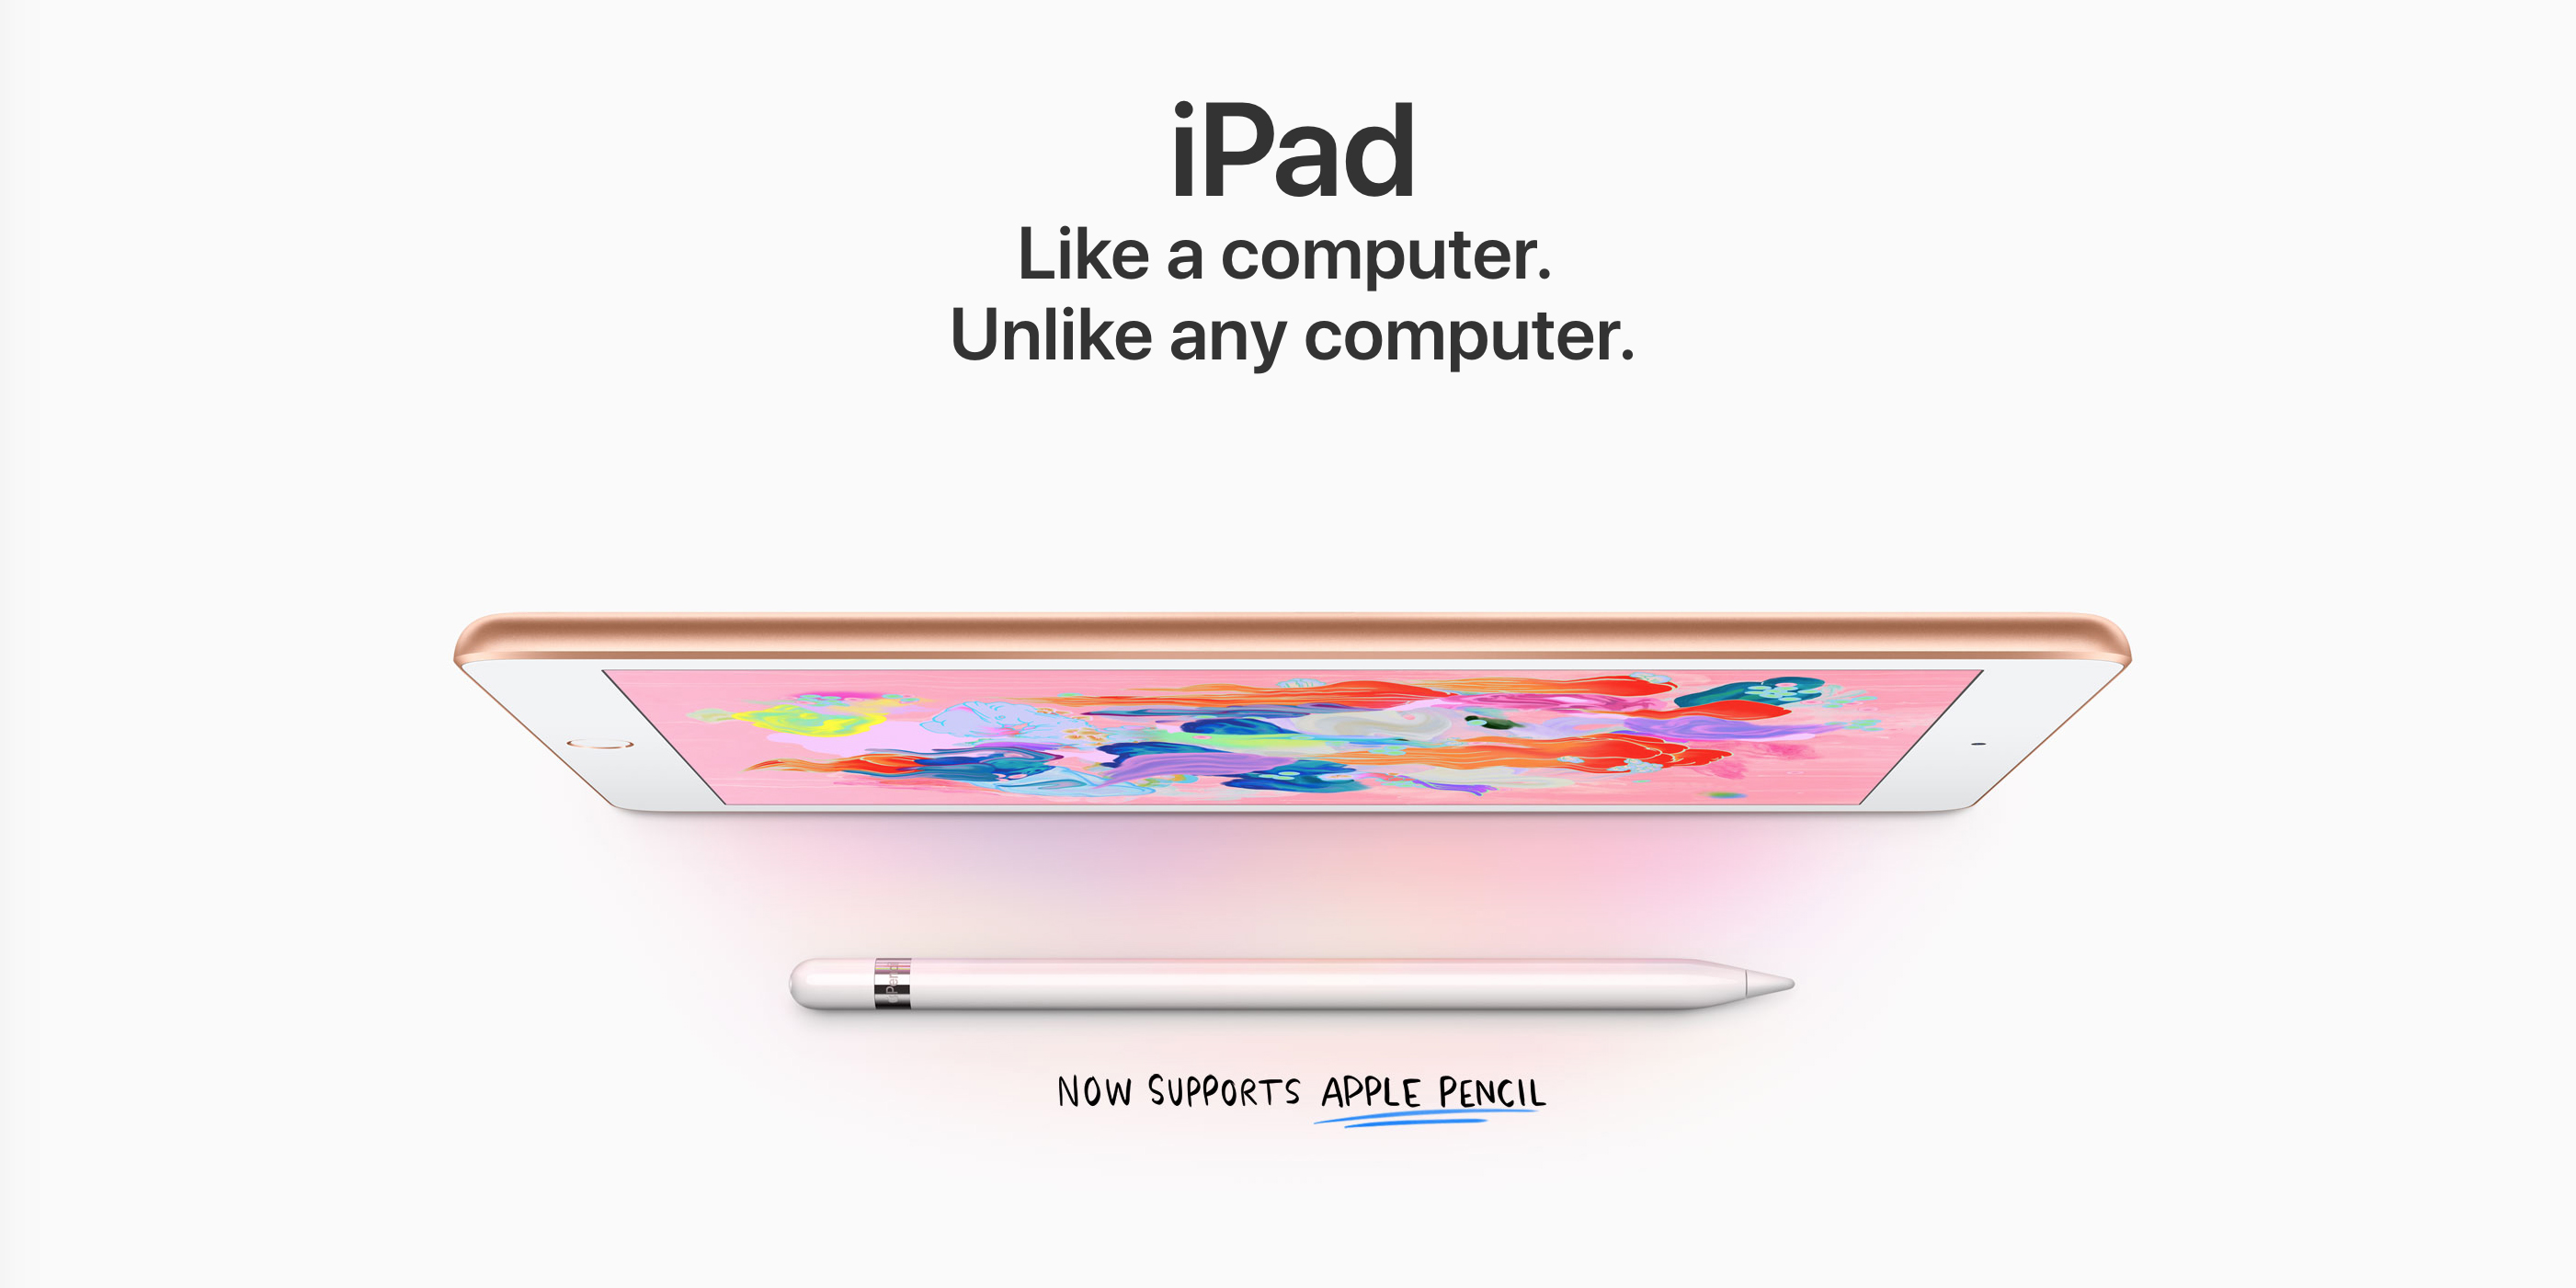 Apple's latest 9.7-inch iPad Wi-Fi 128GB marked down to $365 (Reg. $429)